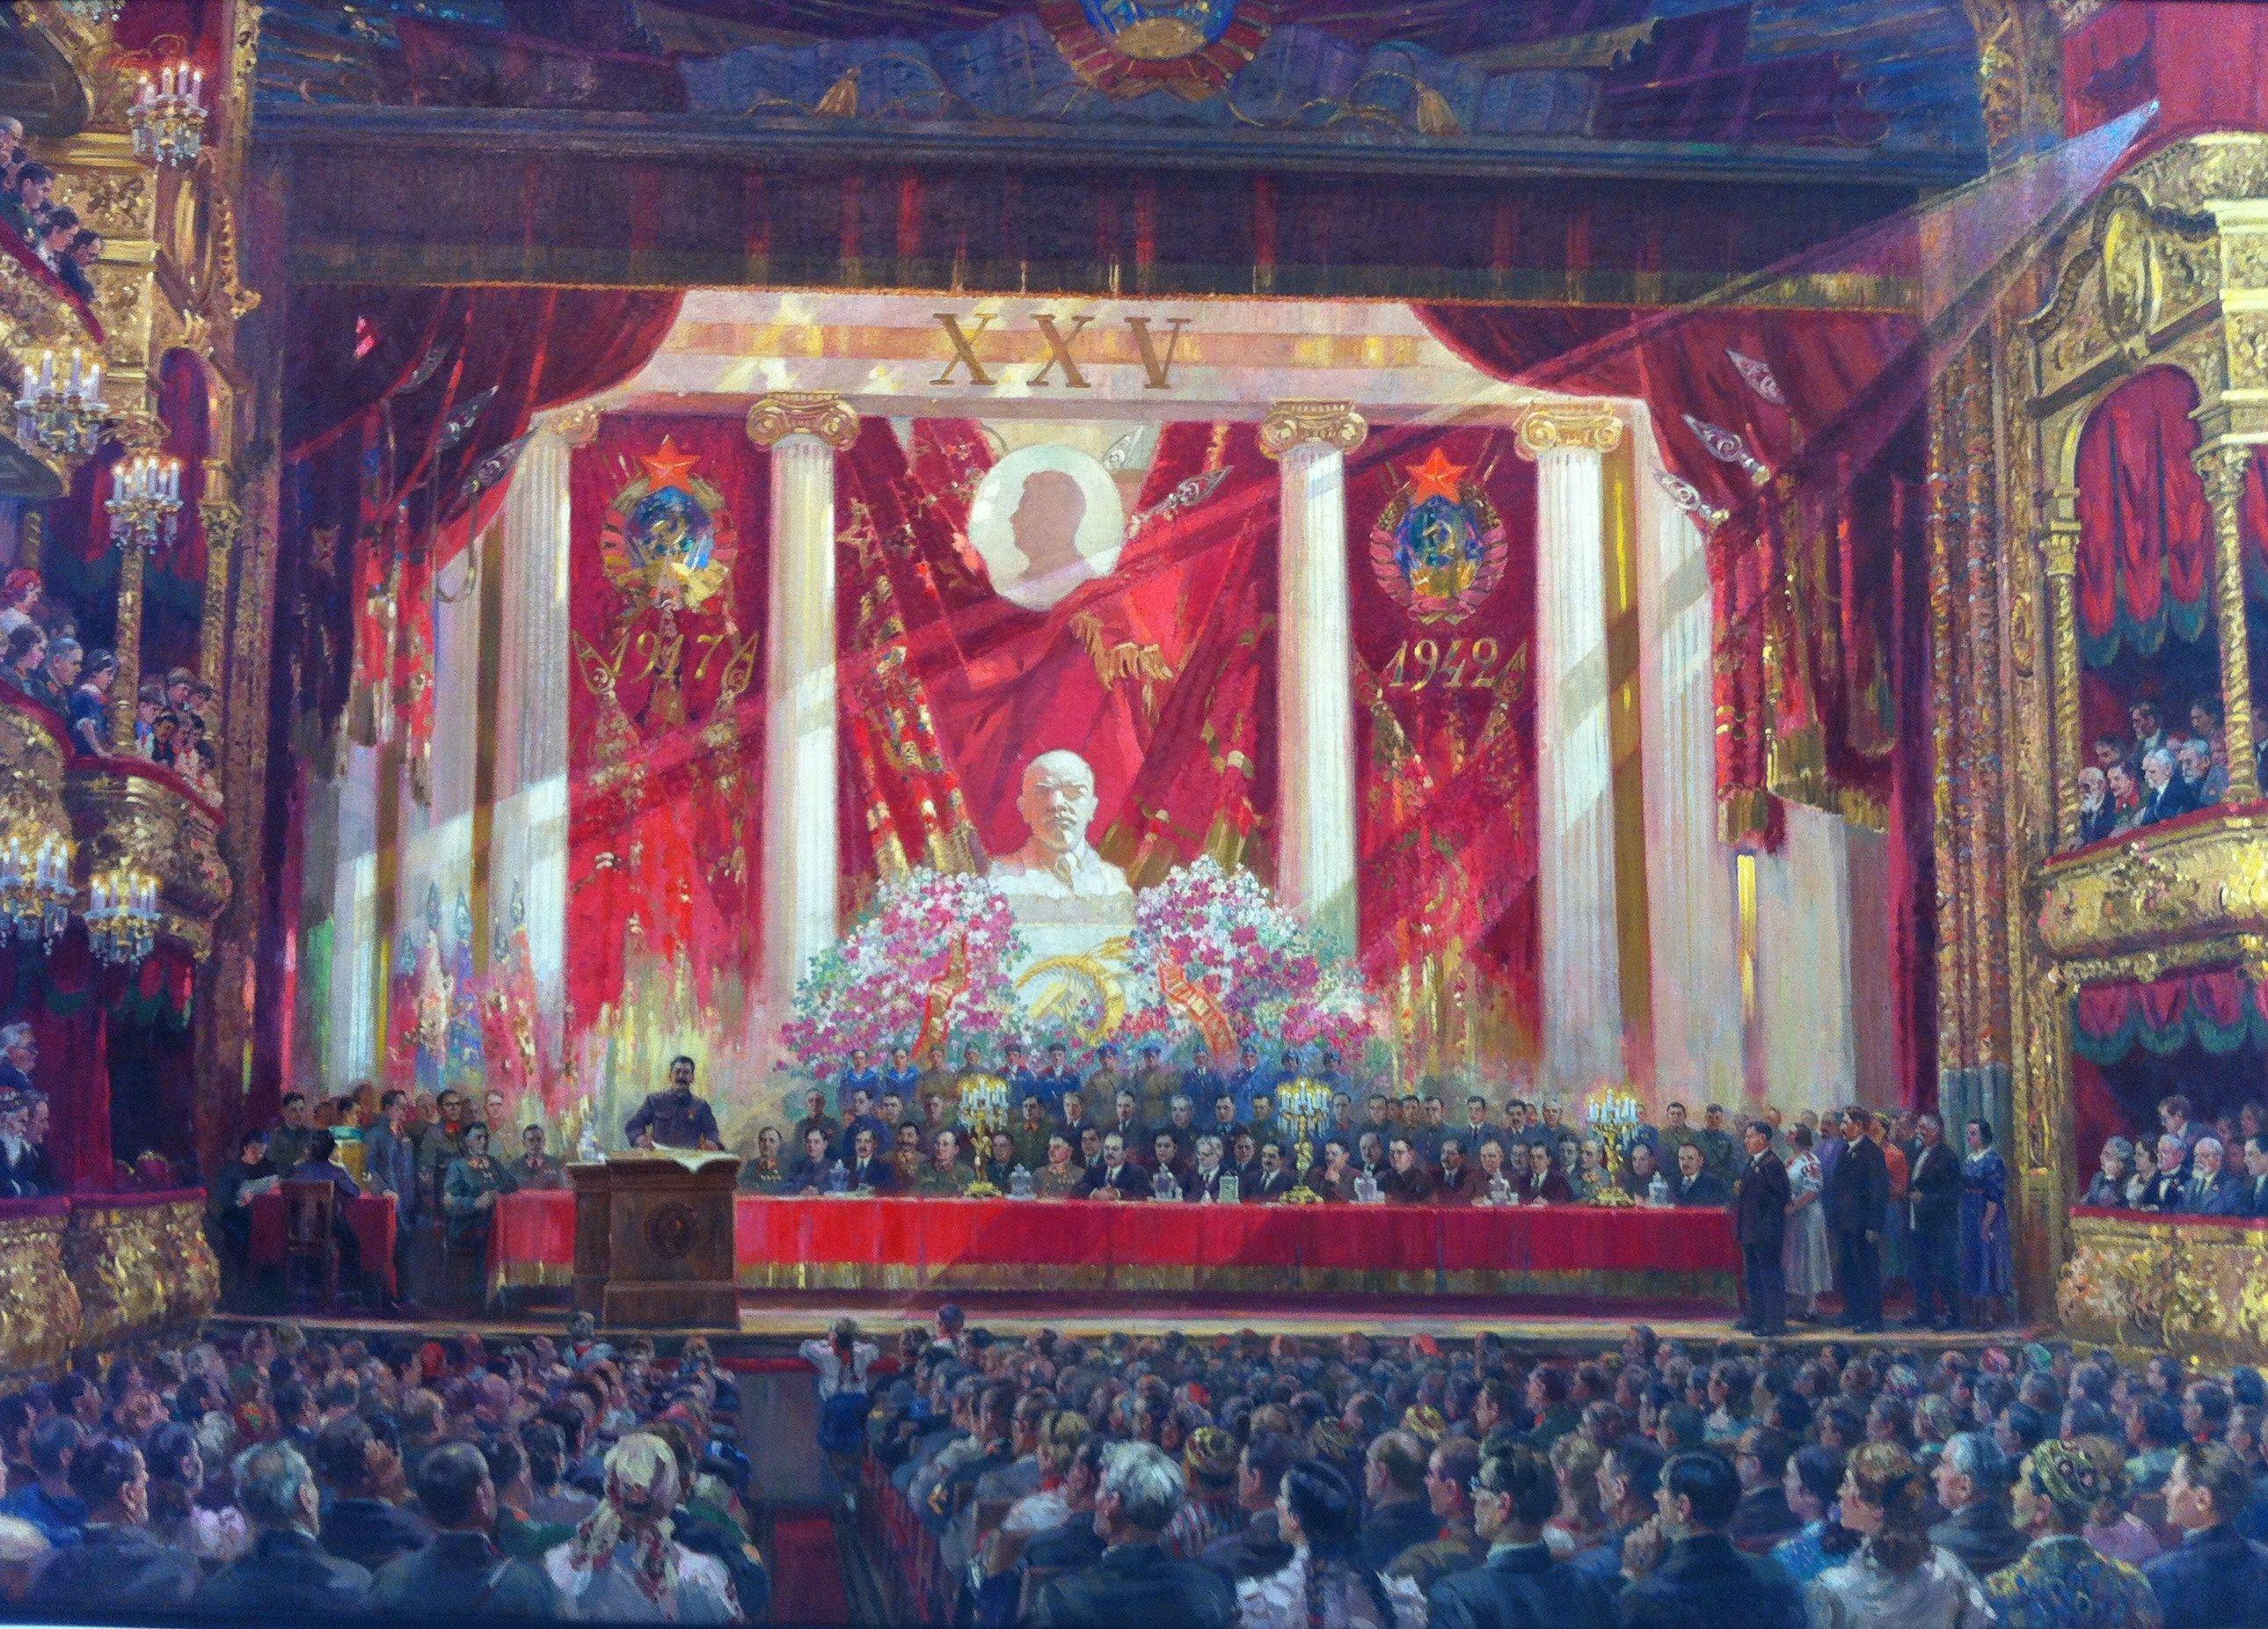 Aleksandr Michajlovitsj Gerasimov Lofzang op Oktober - 1942 Bolshoj Theater Moskou  (Sovjet Mythe Assen)